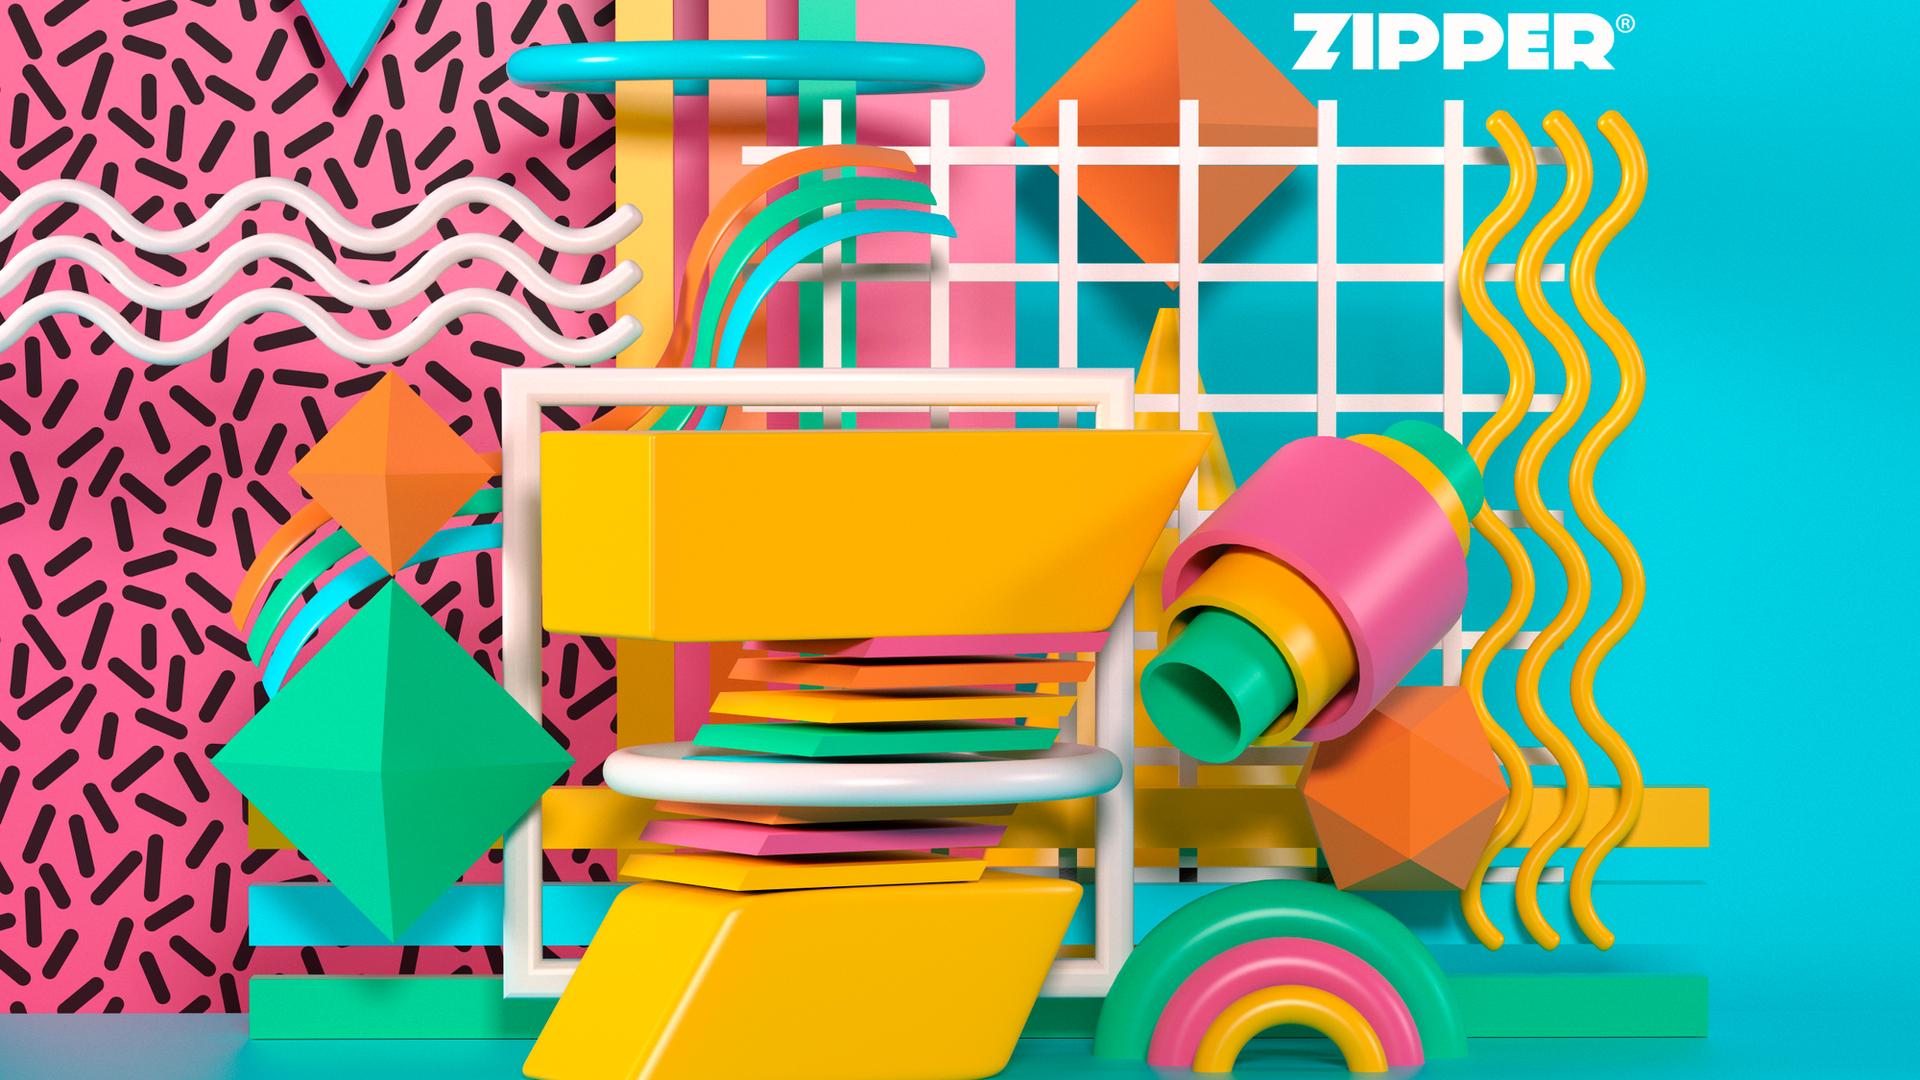 Zipper Mgazine